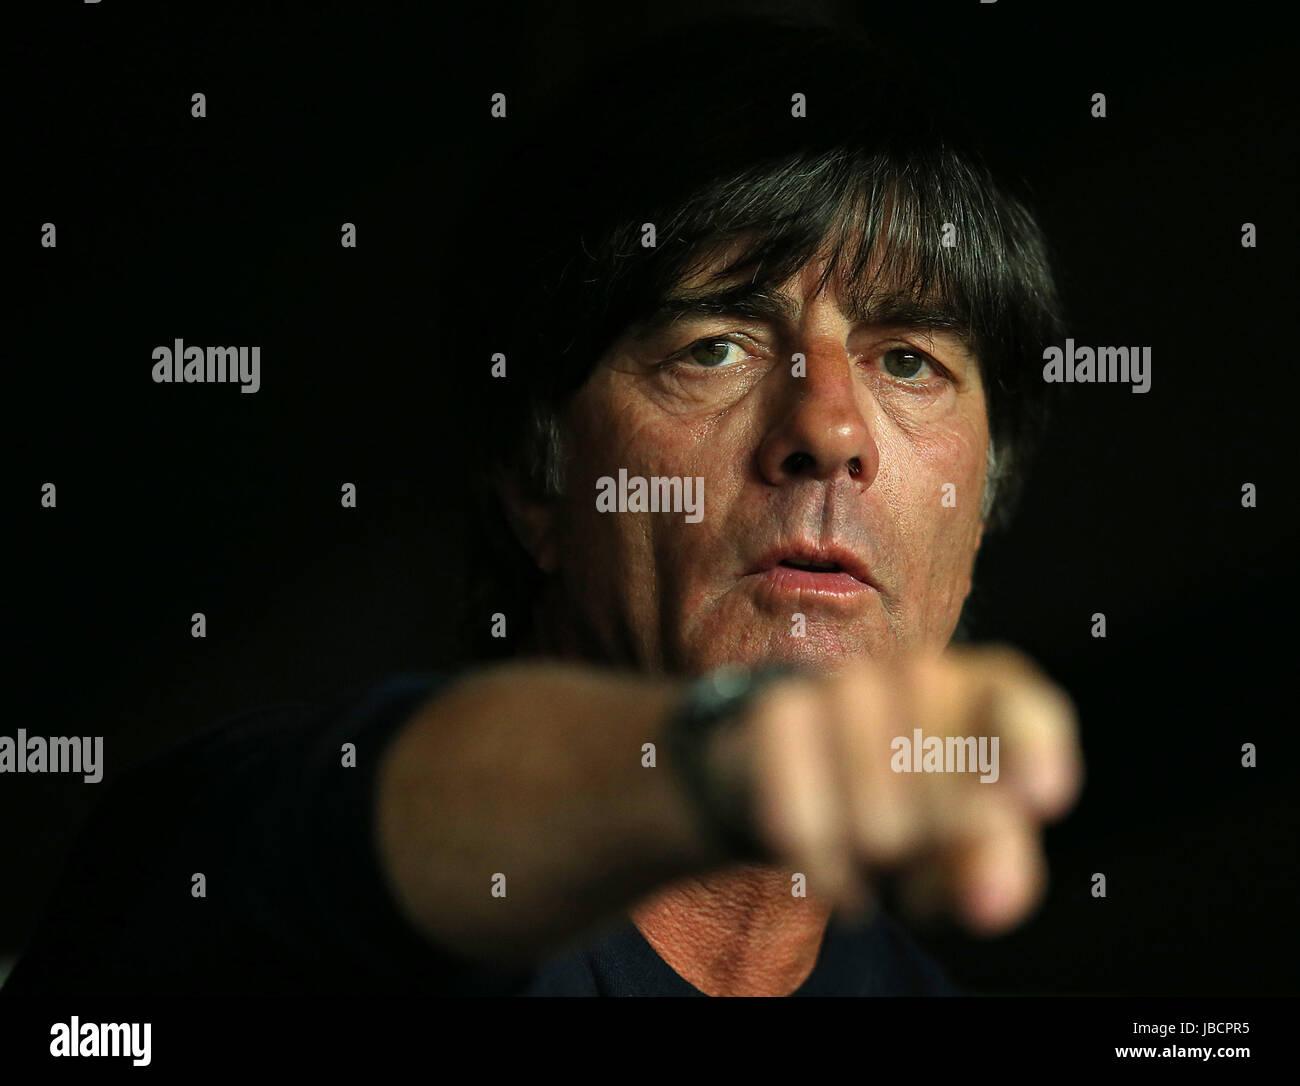 06.06.2017, Fussball Länderspiel, Dänemark - Deutschland, in Brondby Stadion Kopenhagen, Bundestrainer Joachim Löw Stock Photo